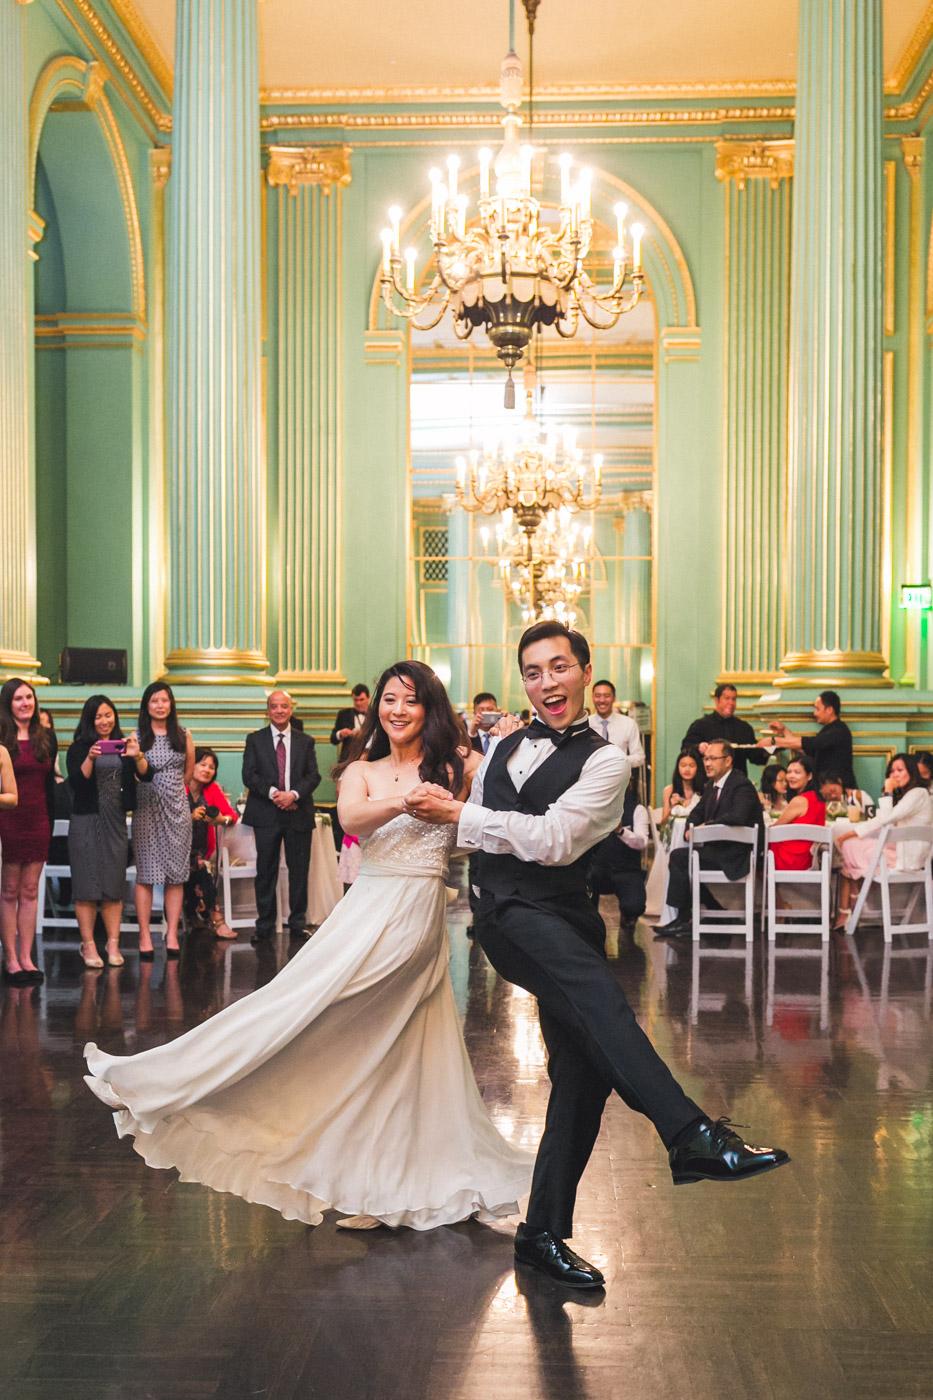 dancing-at-green-room-wedding-reception-war-memorial-opera-house